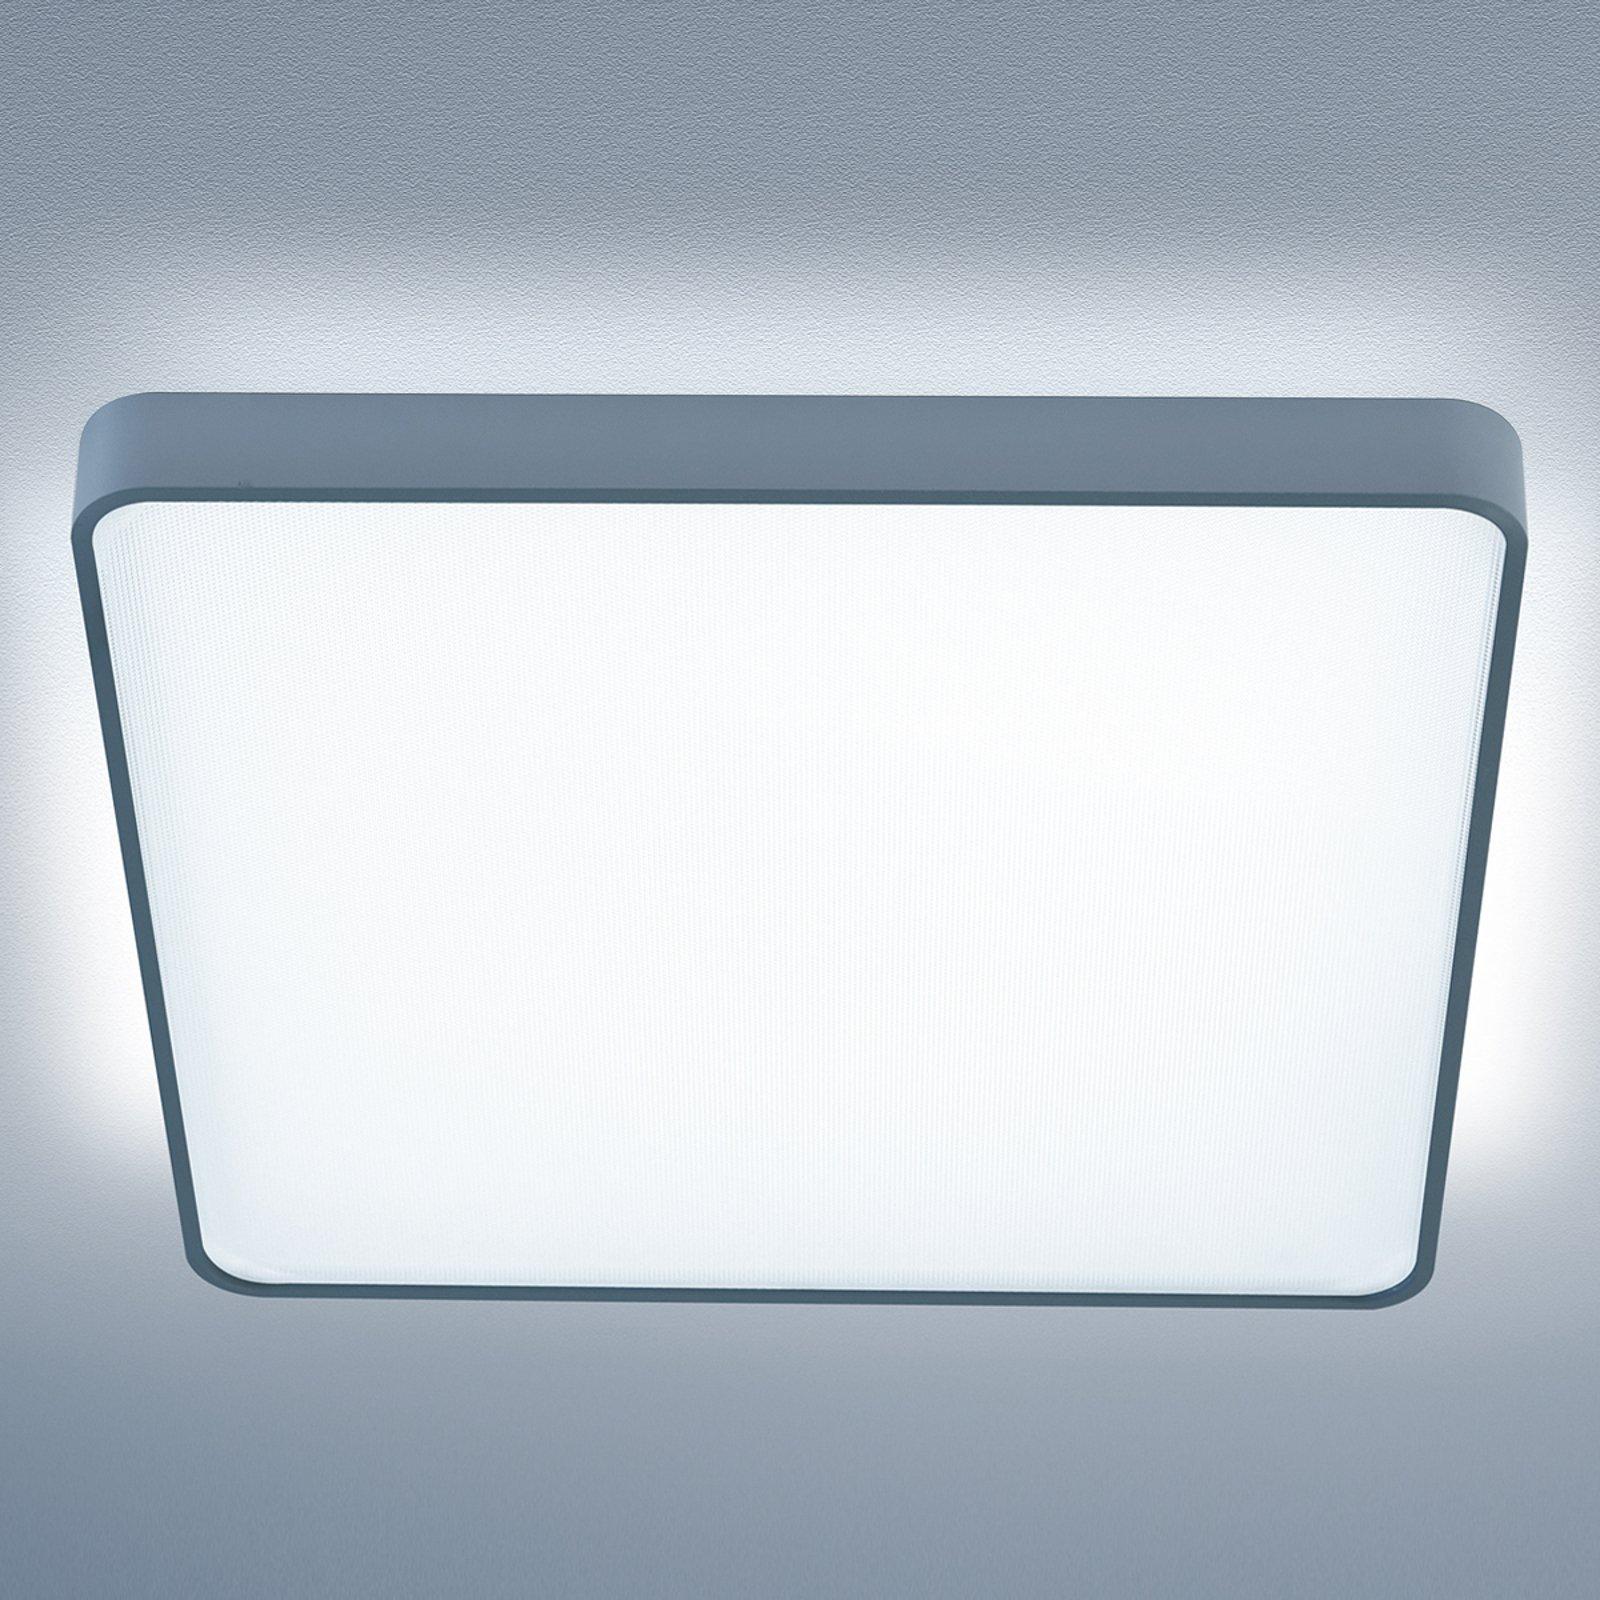 Caleo-X2 kvadr. taklampe LED univer.hvit 90 cm